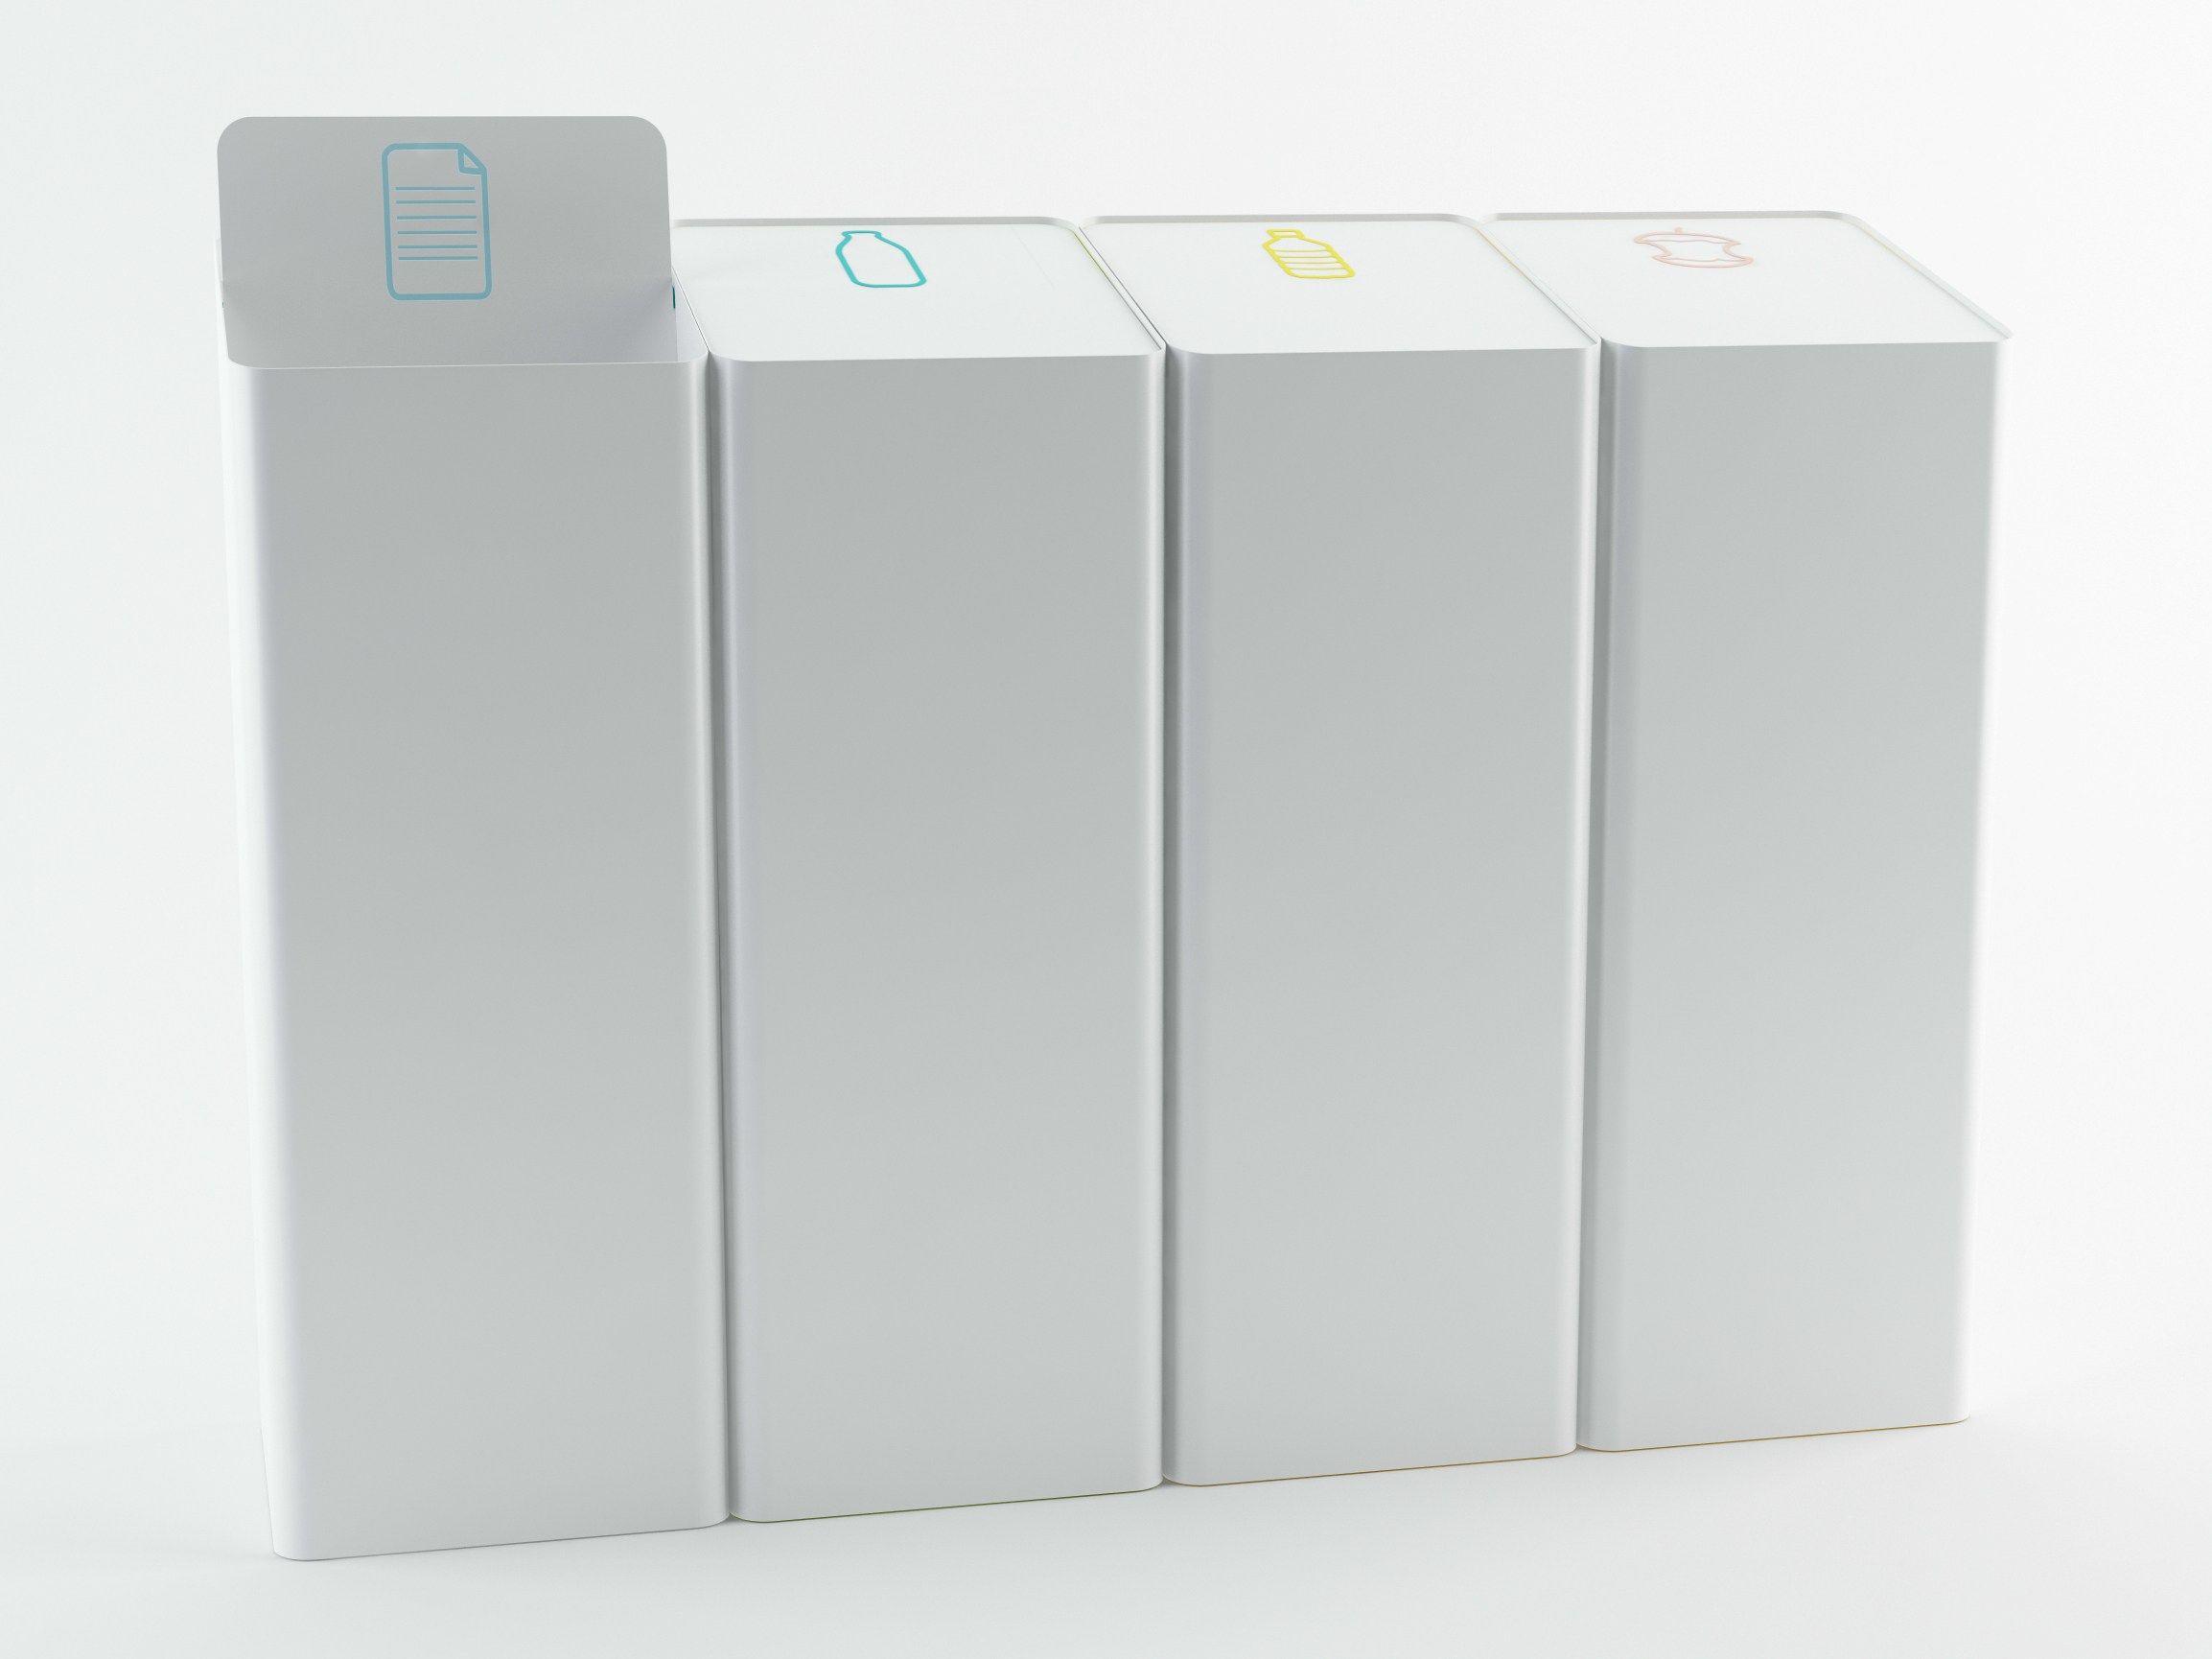 poubelle de tri s lectif berna by made design design stone designs equipe 5 la pinterest. Black Bedroom Furniture Sets. Home Design Ideas